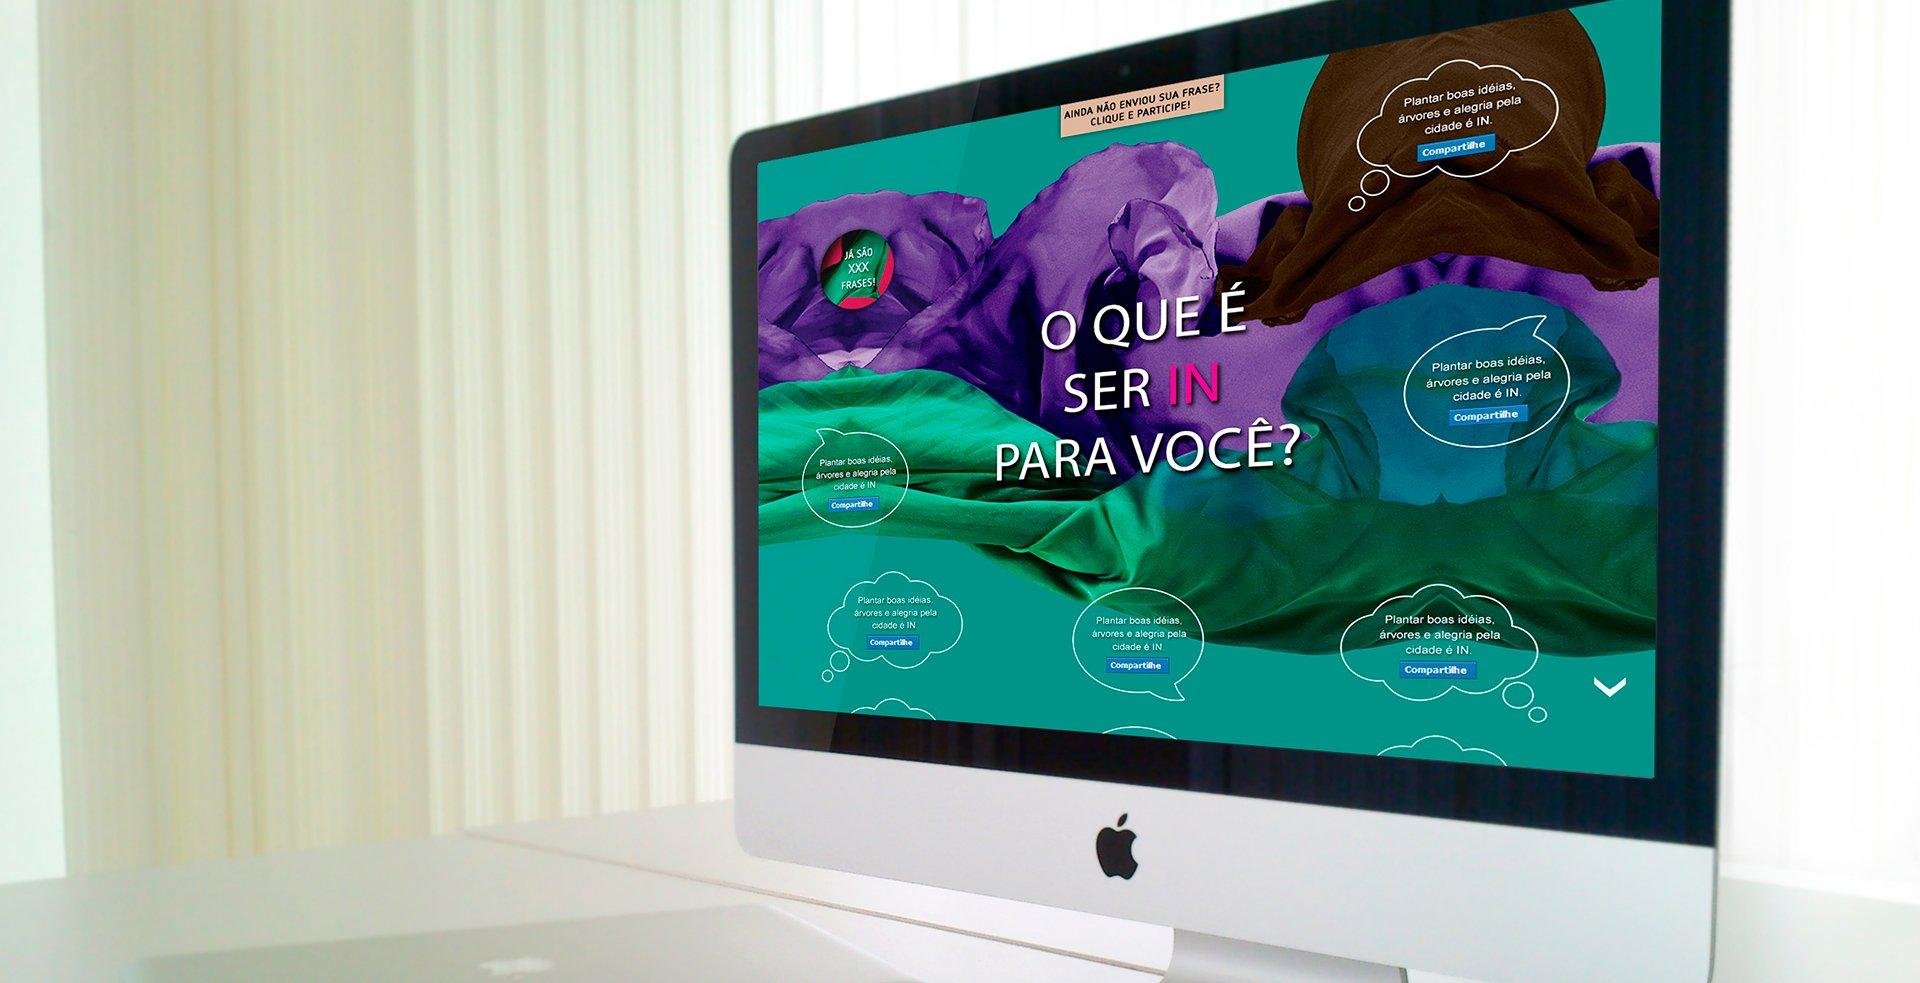 Agência Digital Camandre - SEO